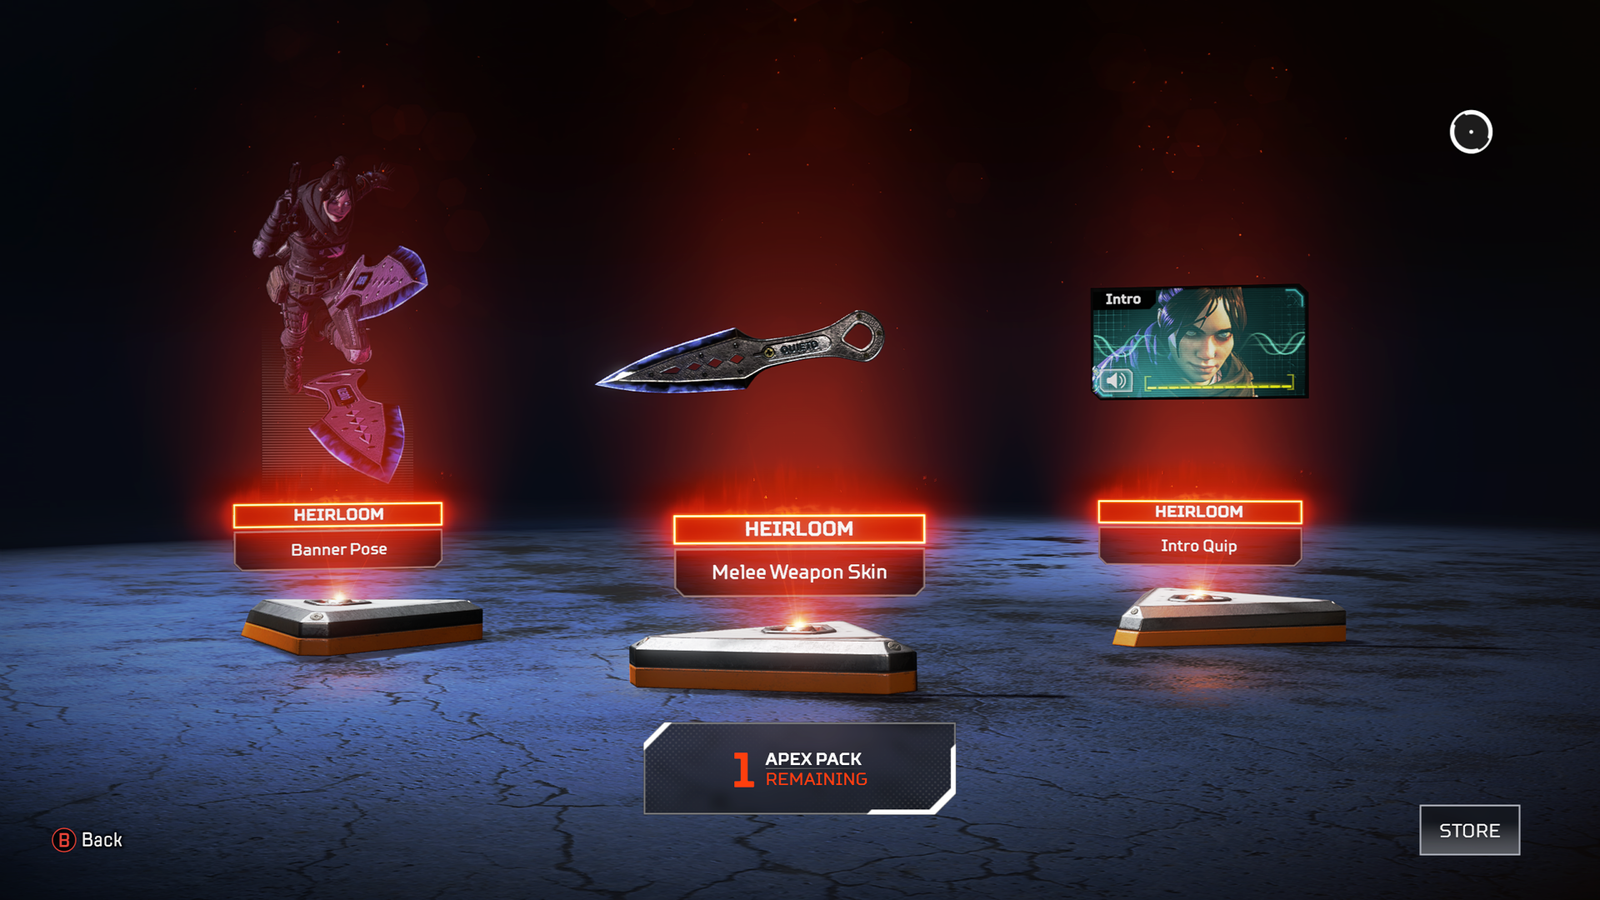 Apex Legends Player Spent $500 To Unlock A Rare Item, Says